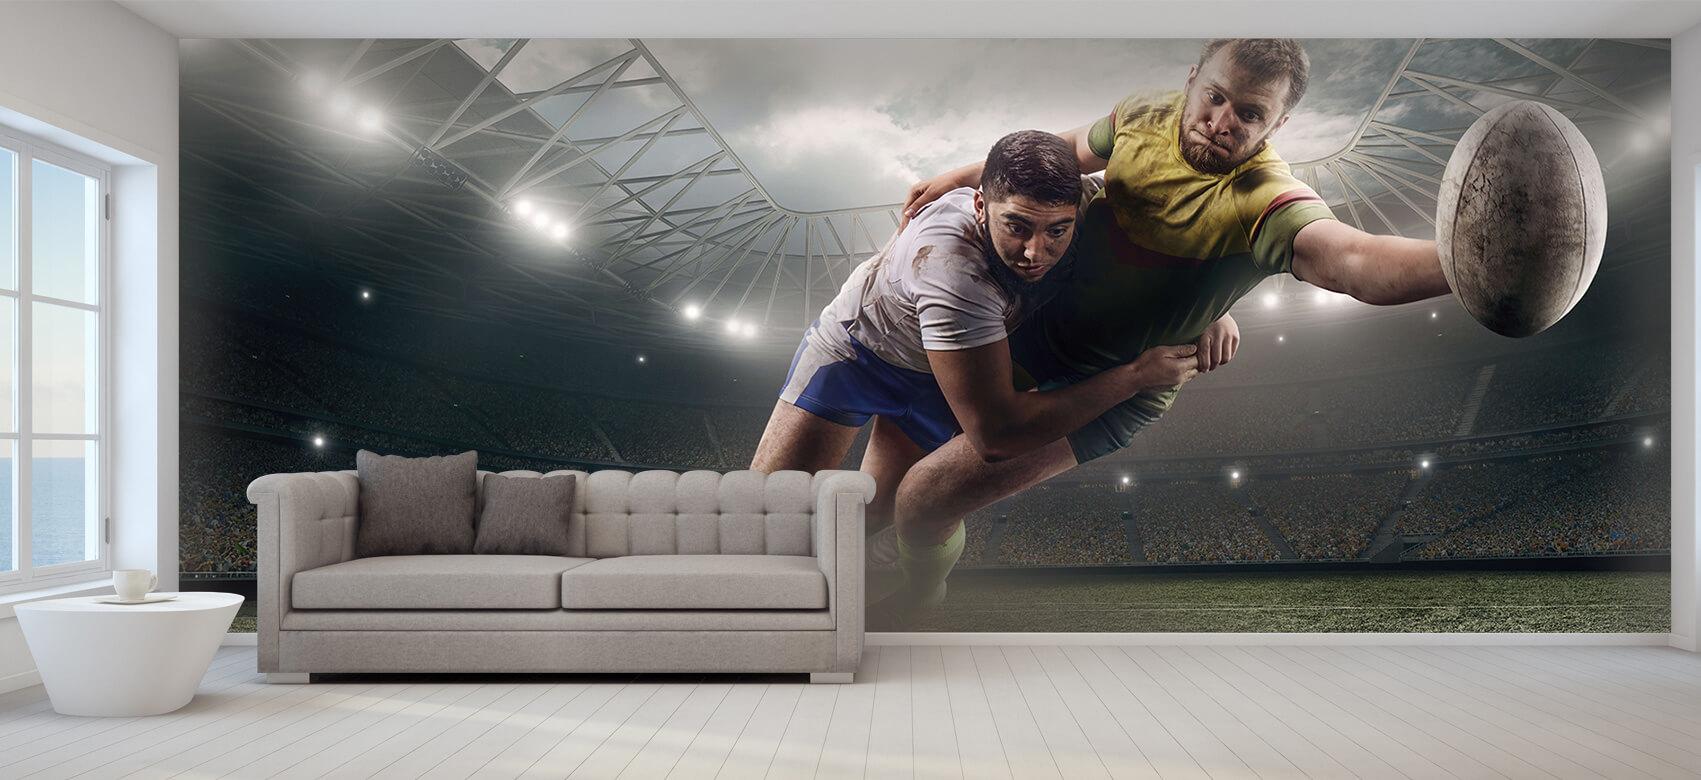 Sport Rugby spelers 1